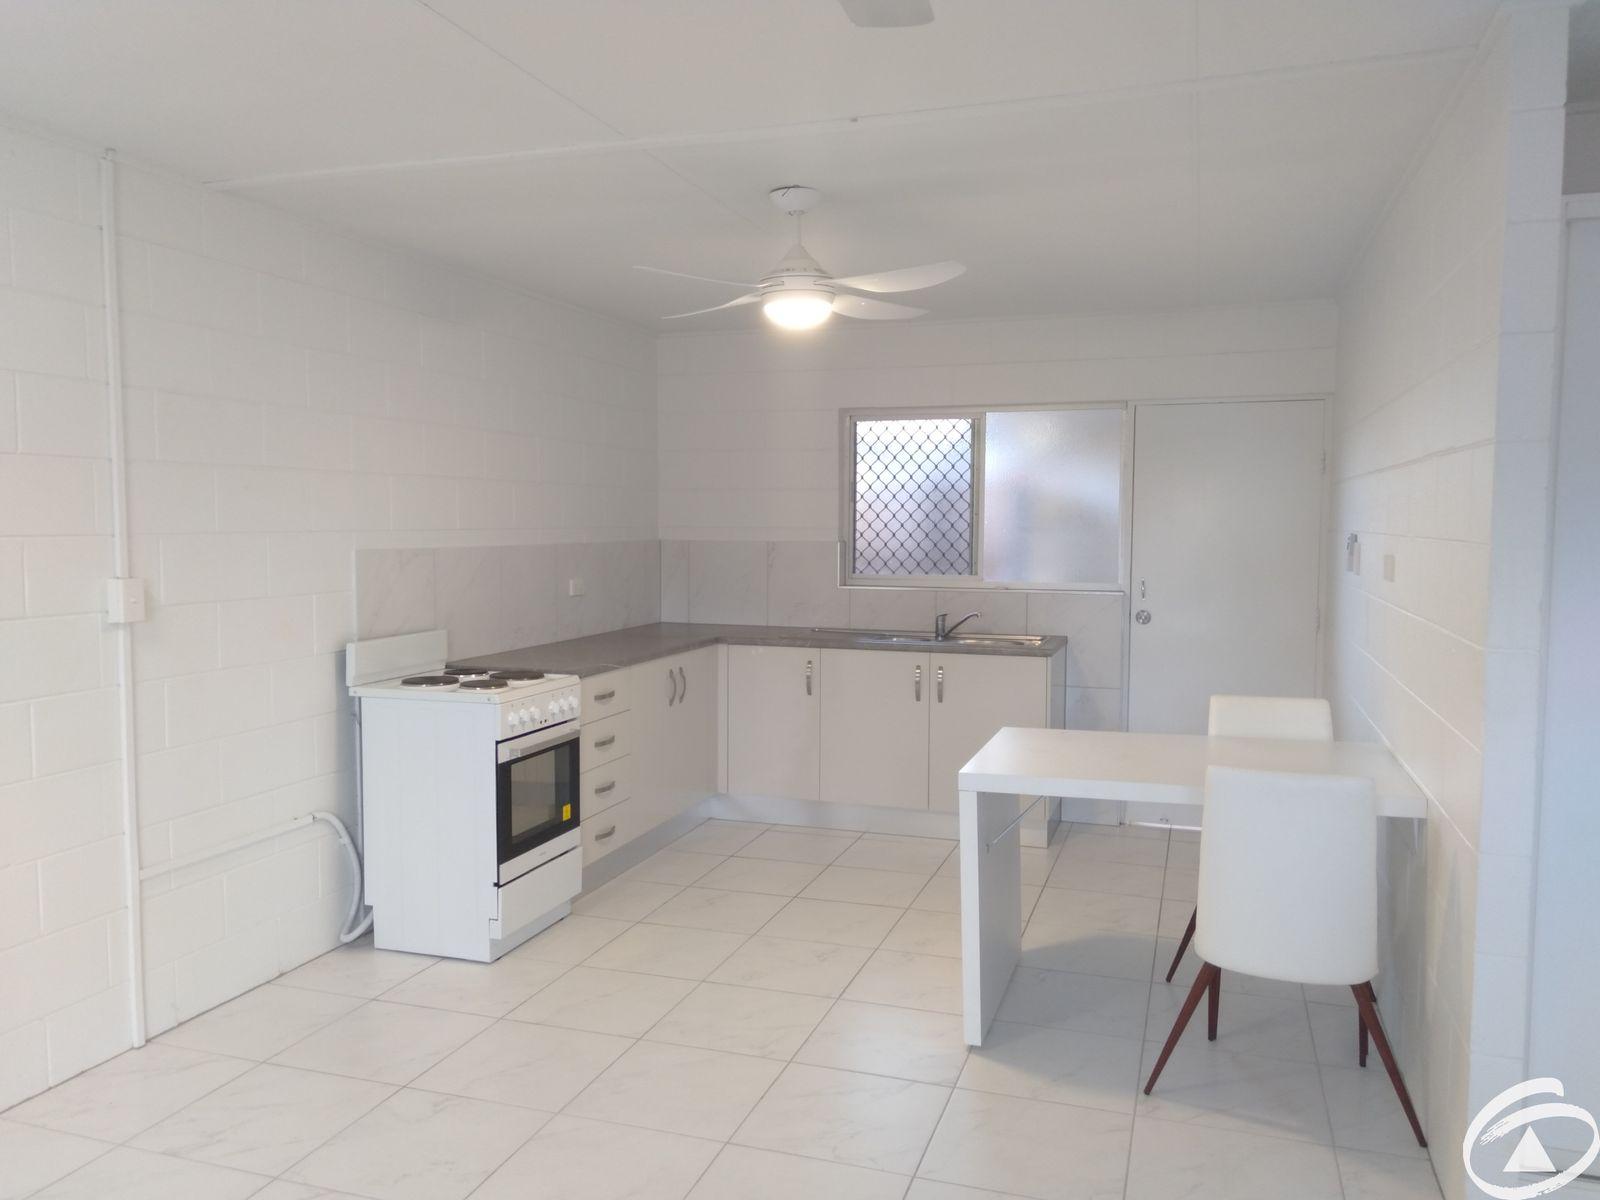 3/1-3 Anderson Street, Manunda, QLD 4870